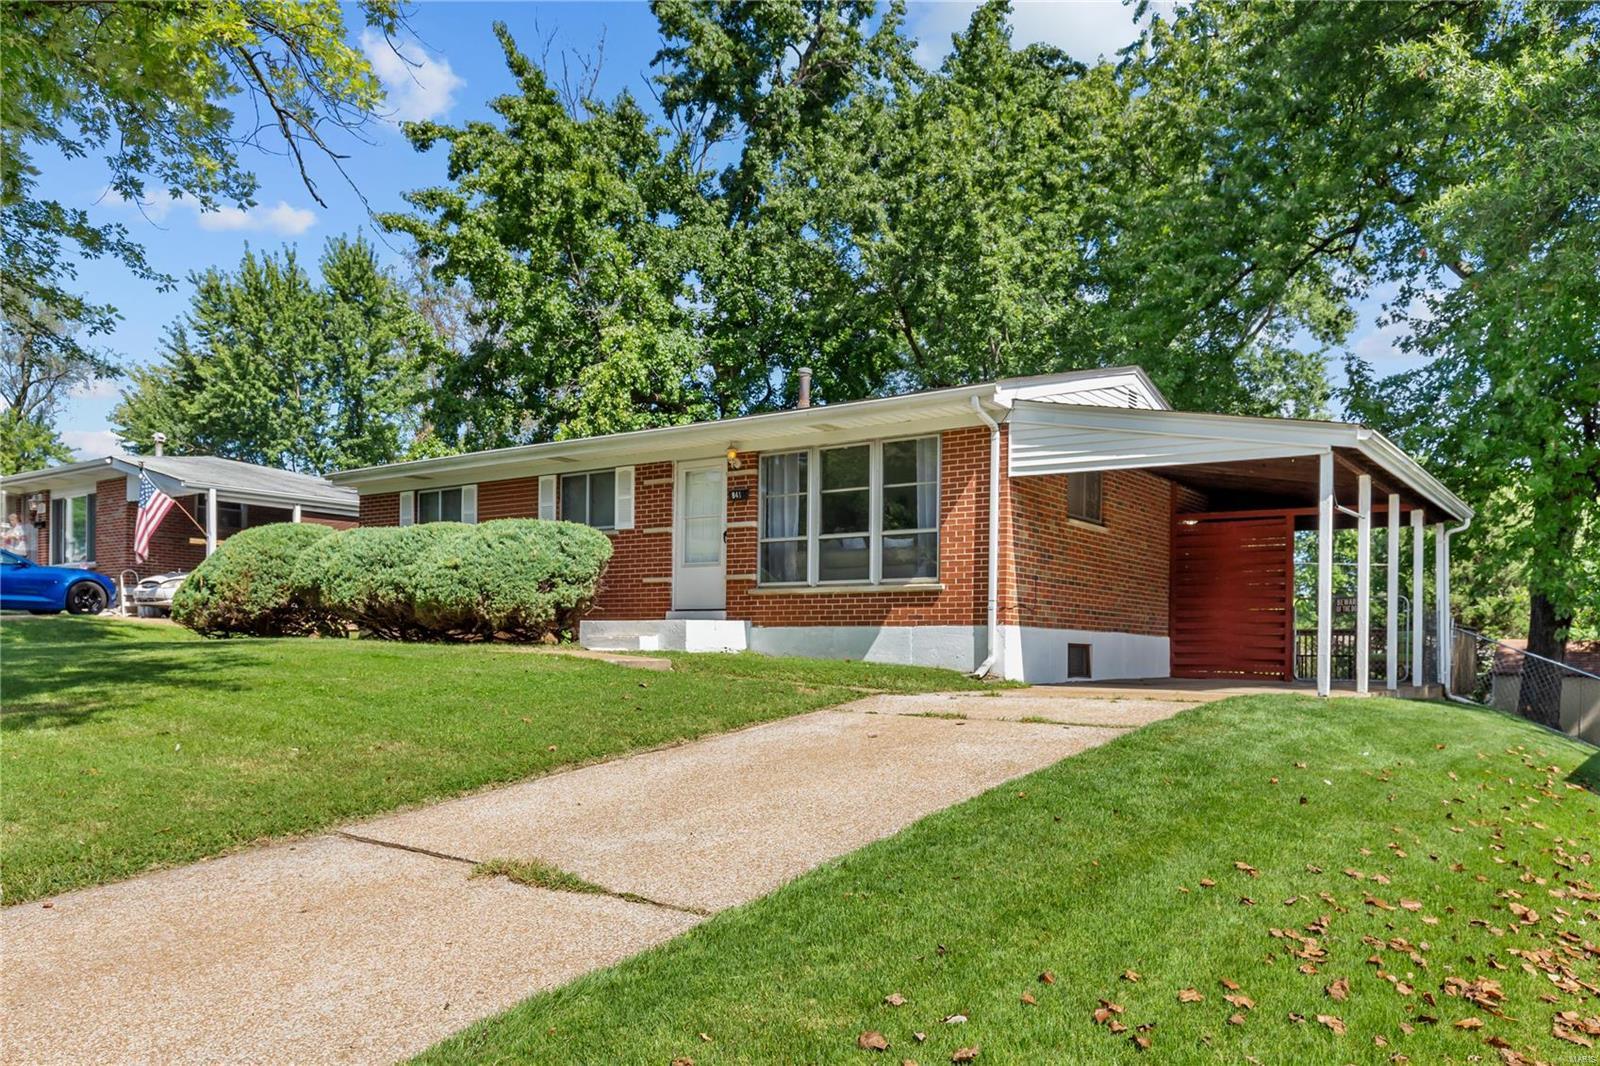 841 Riderwood Property Photo